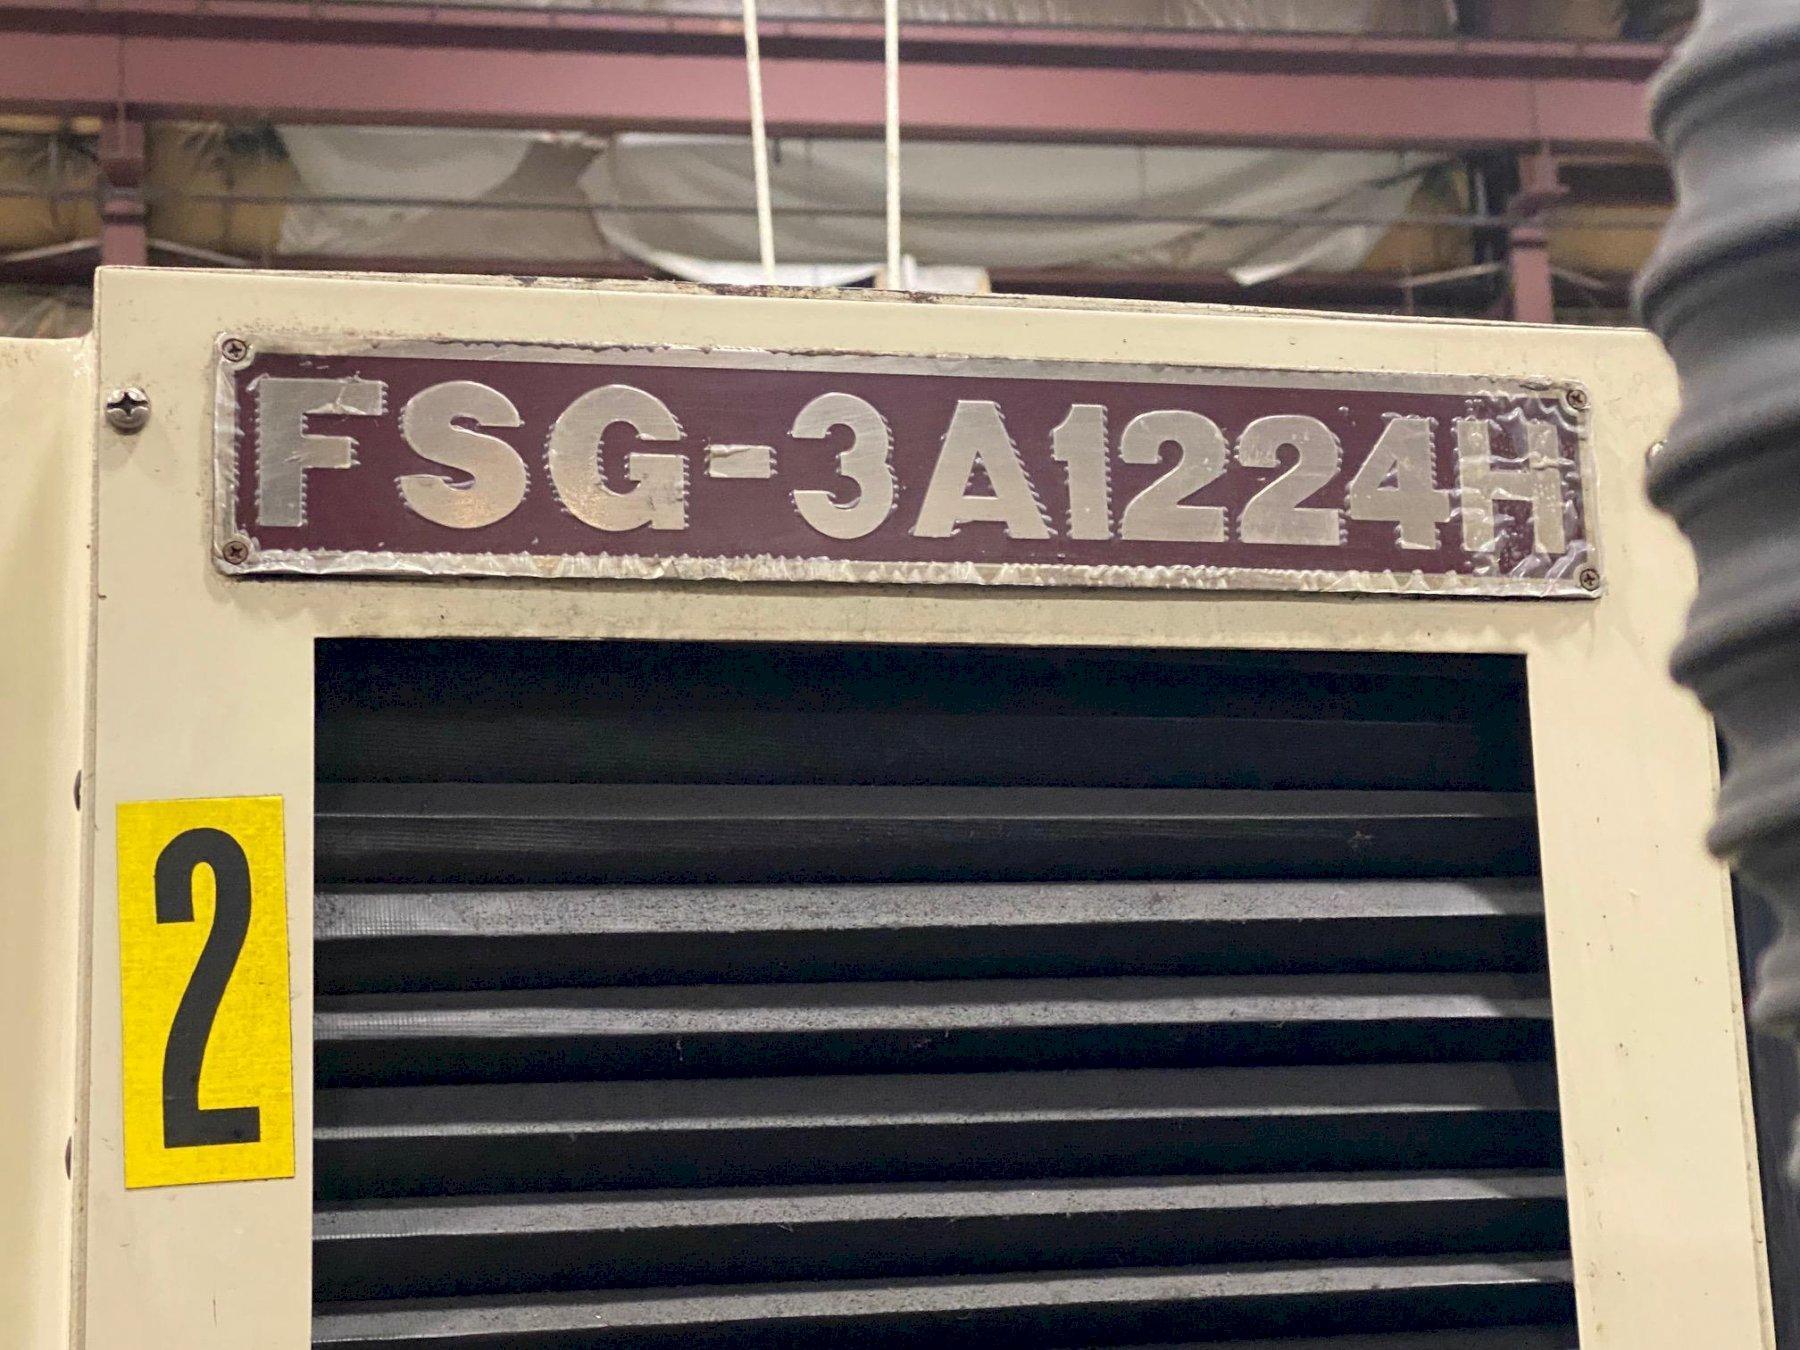 Chevalier FSG-3A1224H Surface Grinder